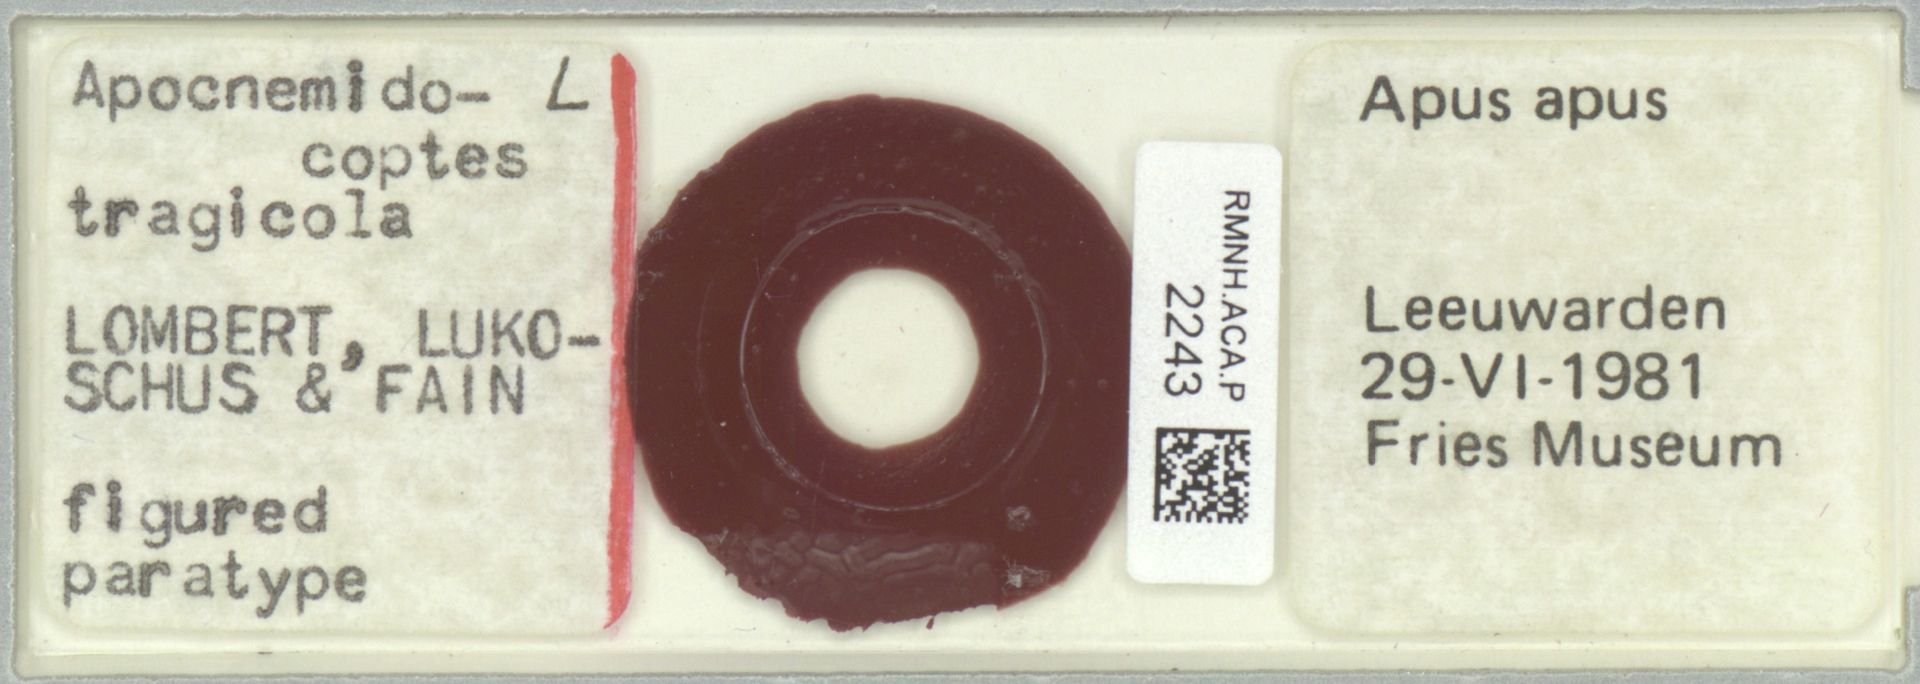 RMNH.ACA.P.2243 | Apocnemidocoptes tragicola Lombert, Lukoschus & Fain